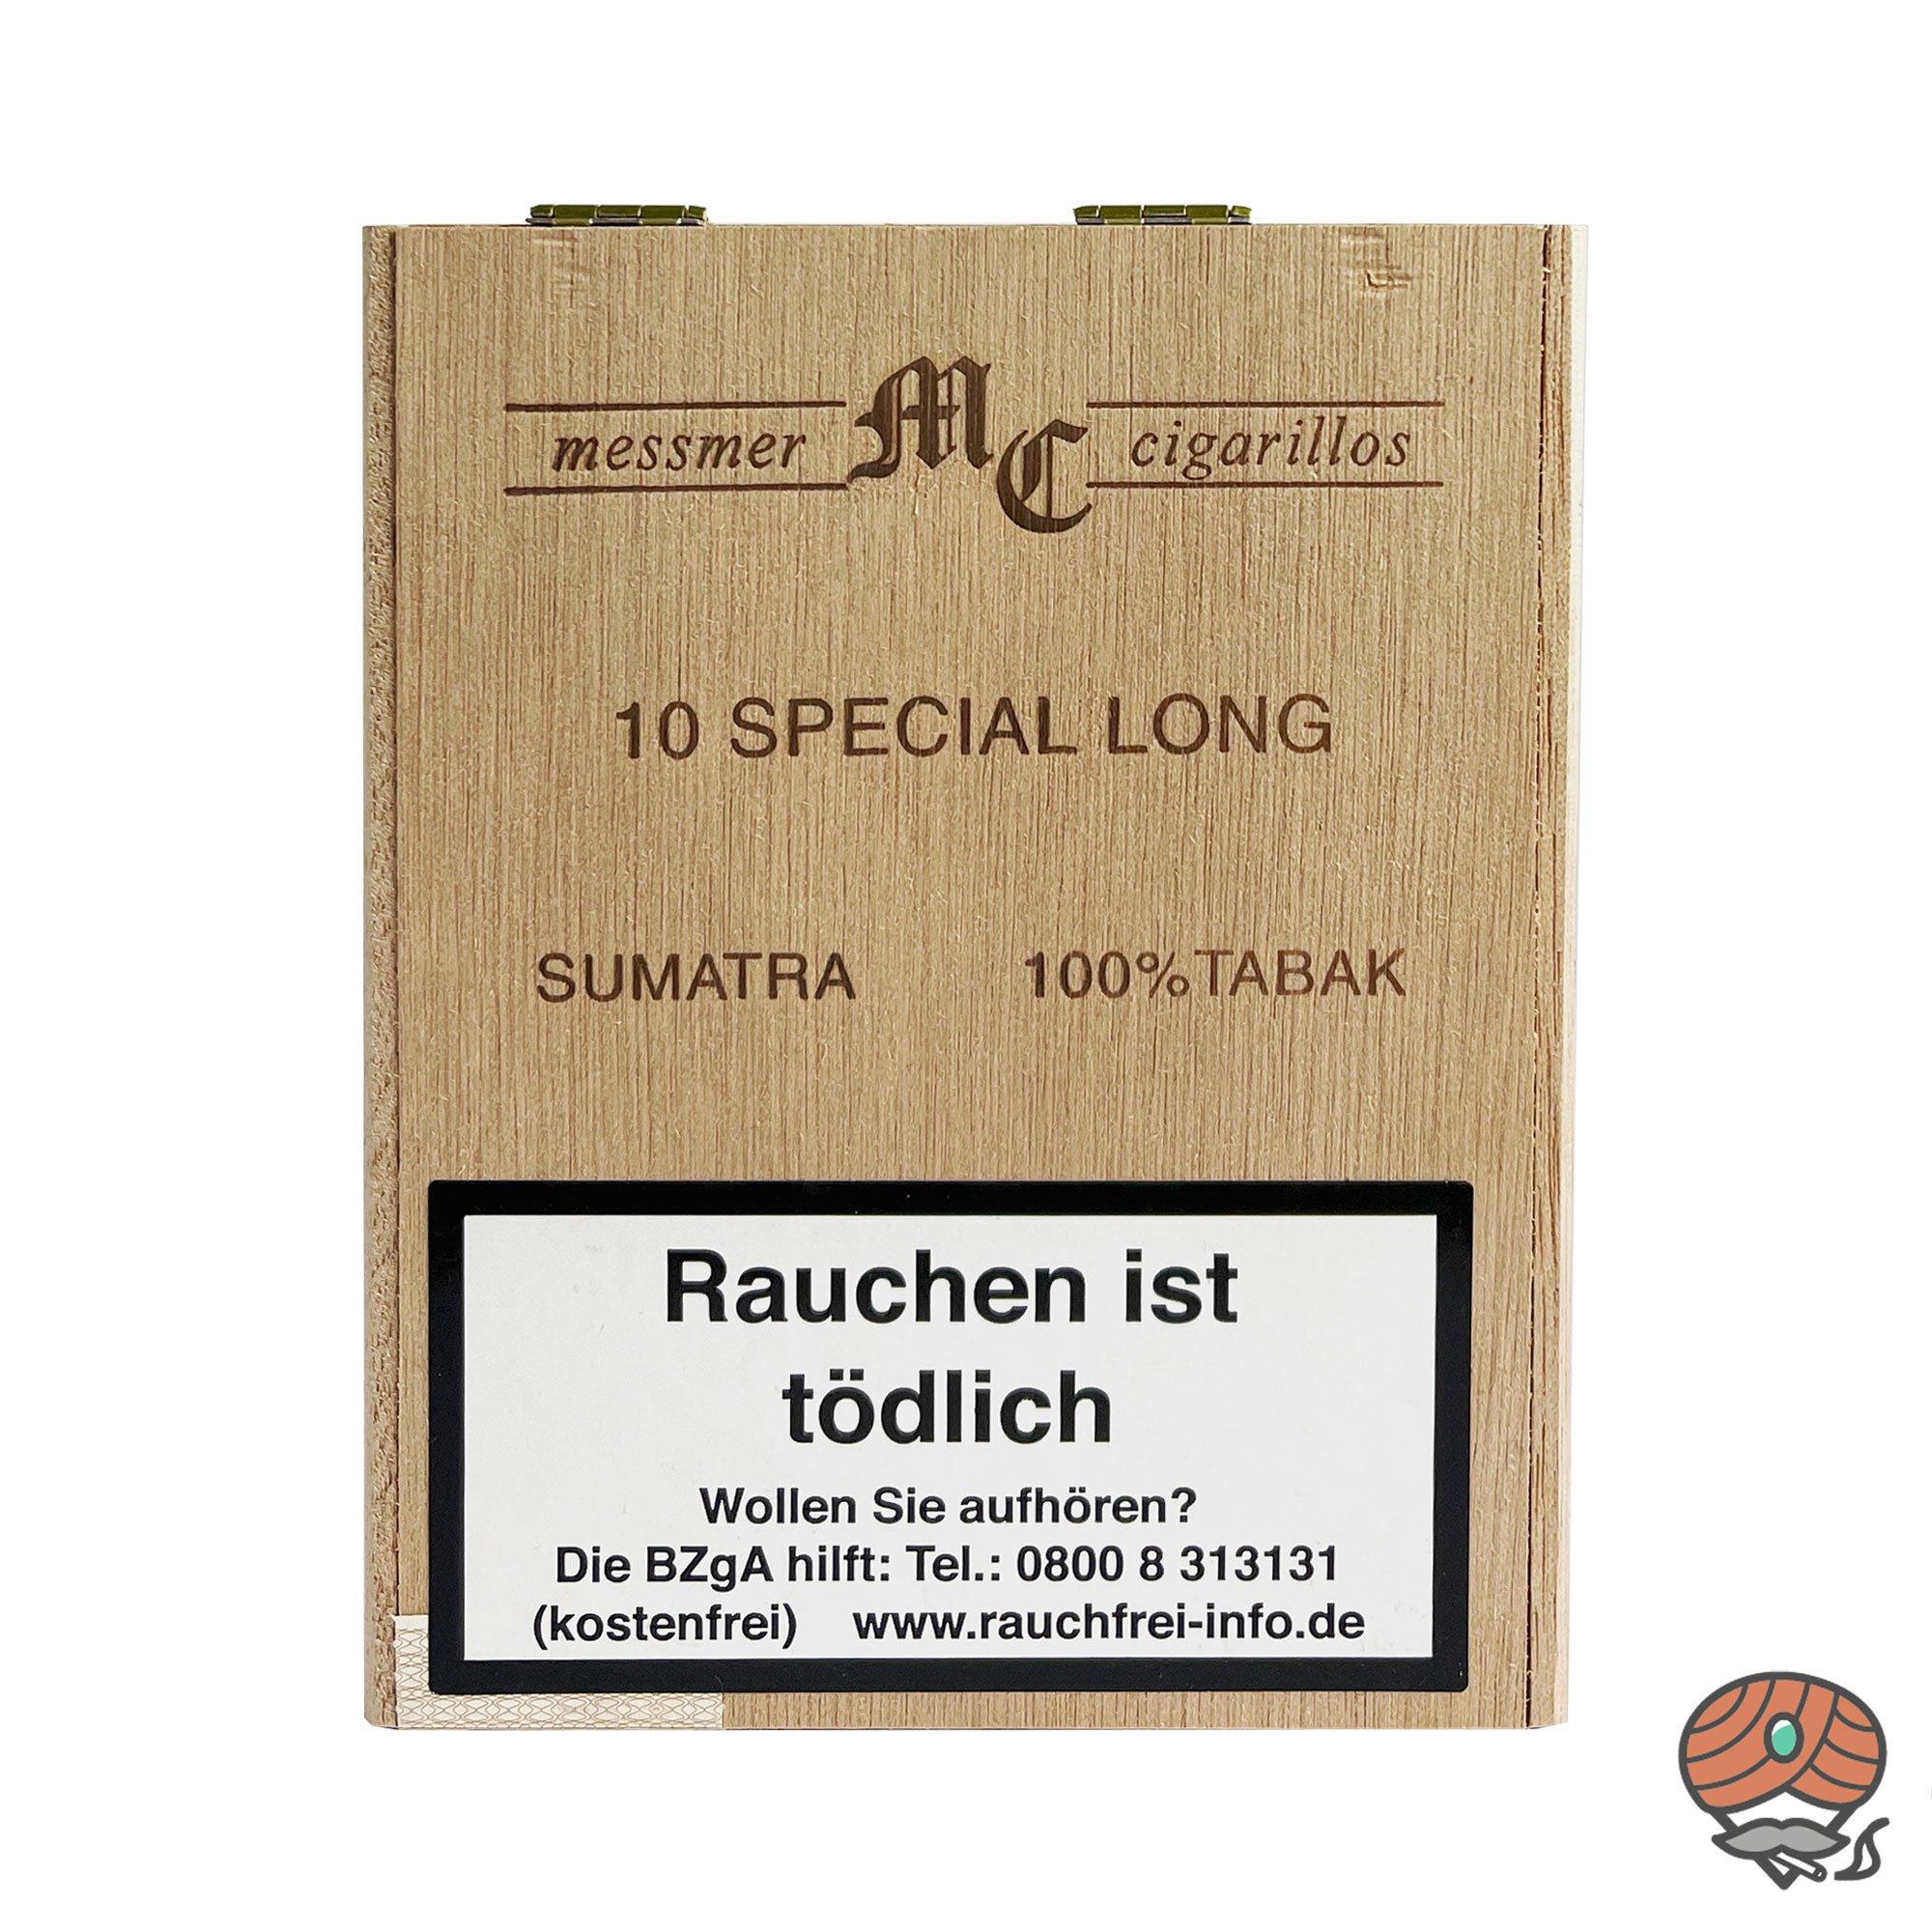 MC messmer cigarillos Special Long Sumatra Zigarillos 100 % Tabak